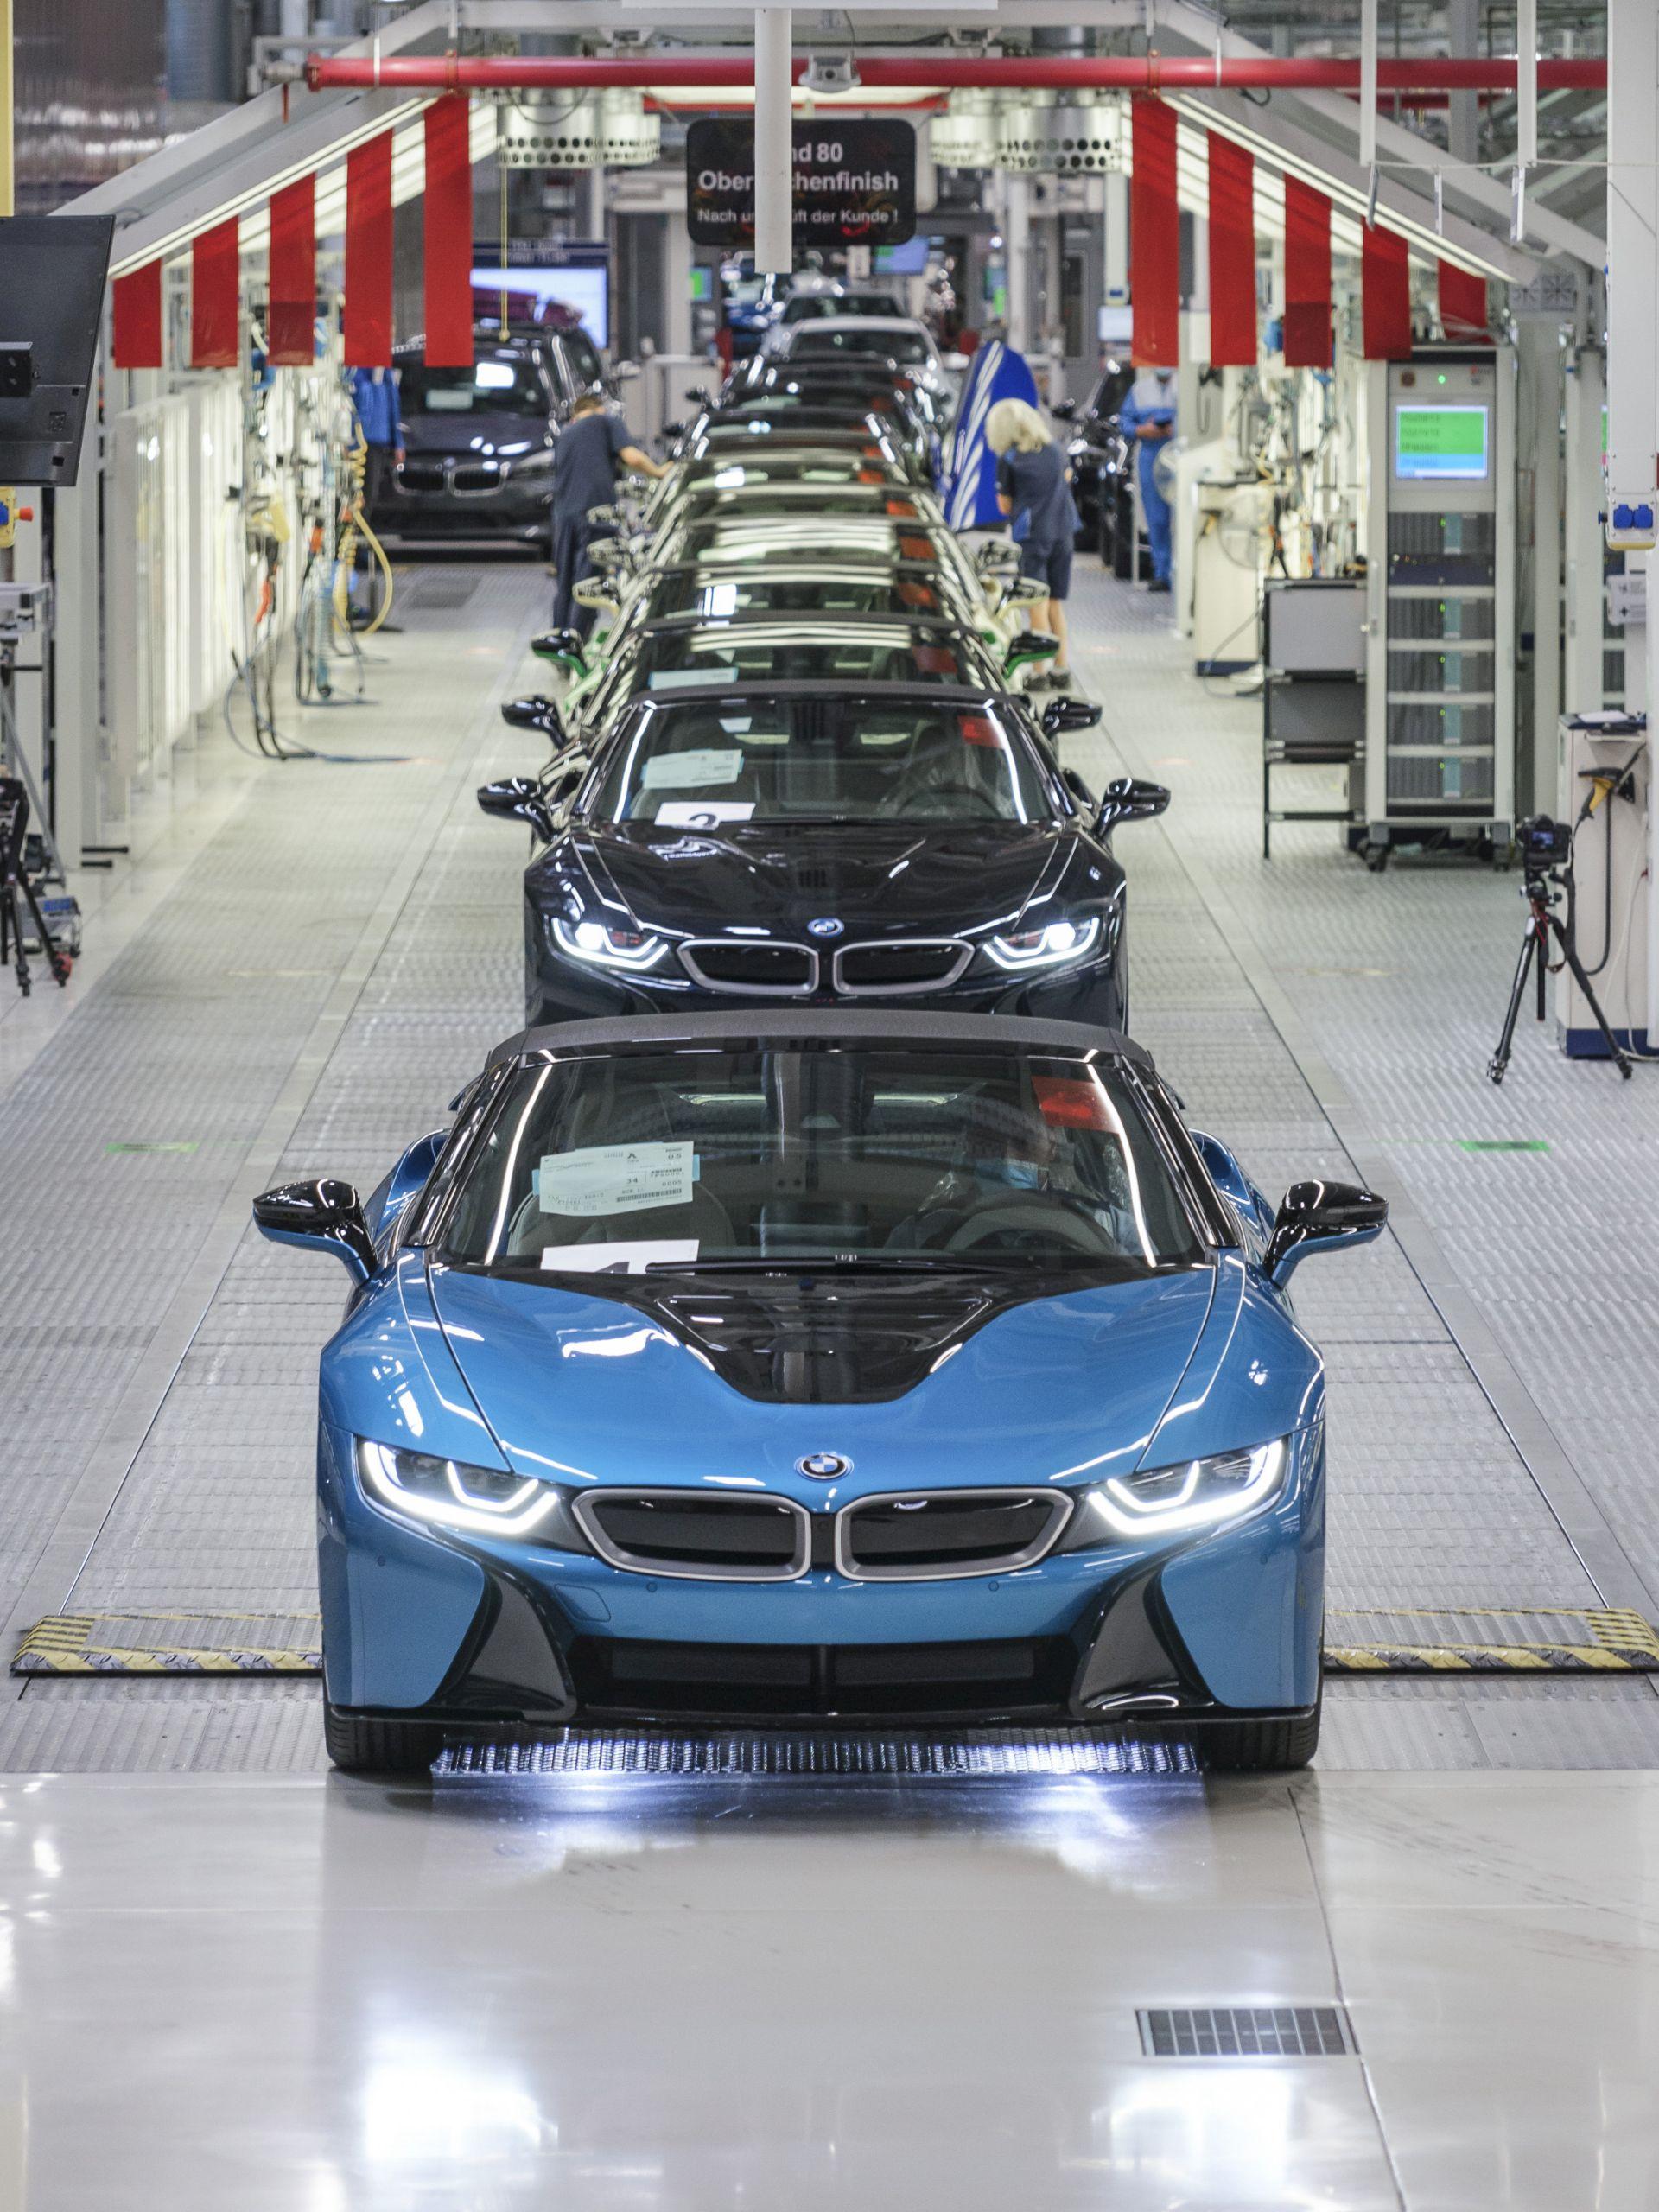 Final BMW i8 Models 70